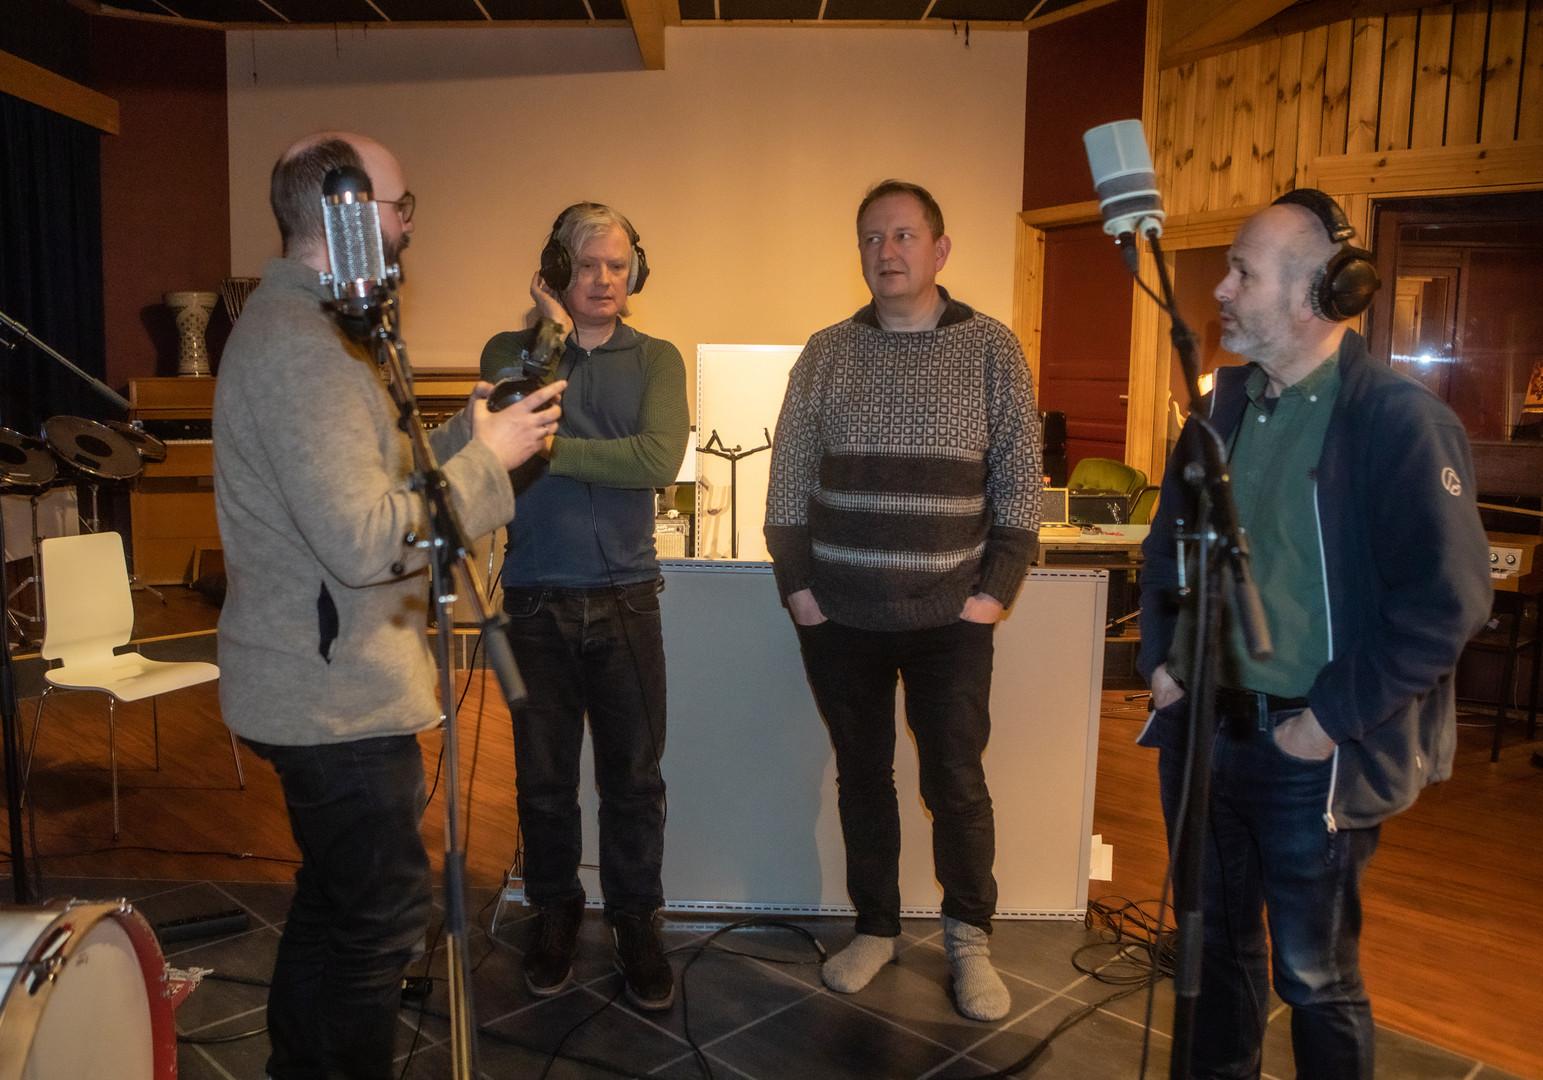 pilegrimen i studio.jpg